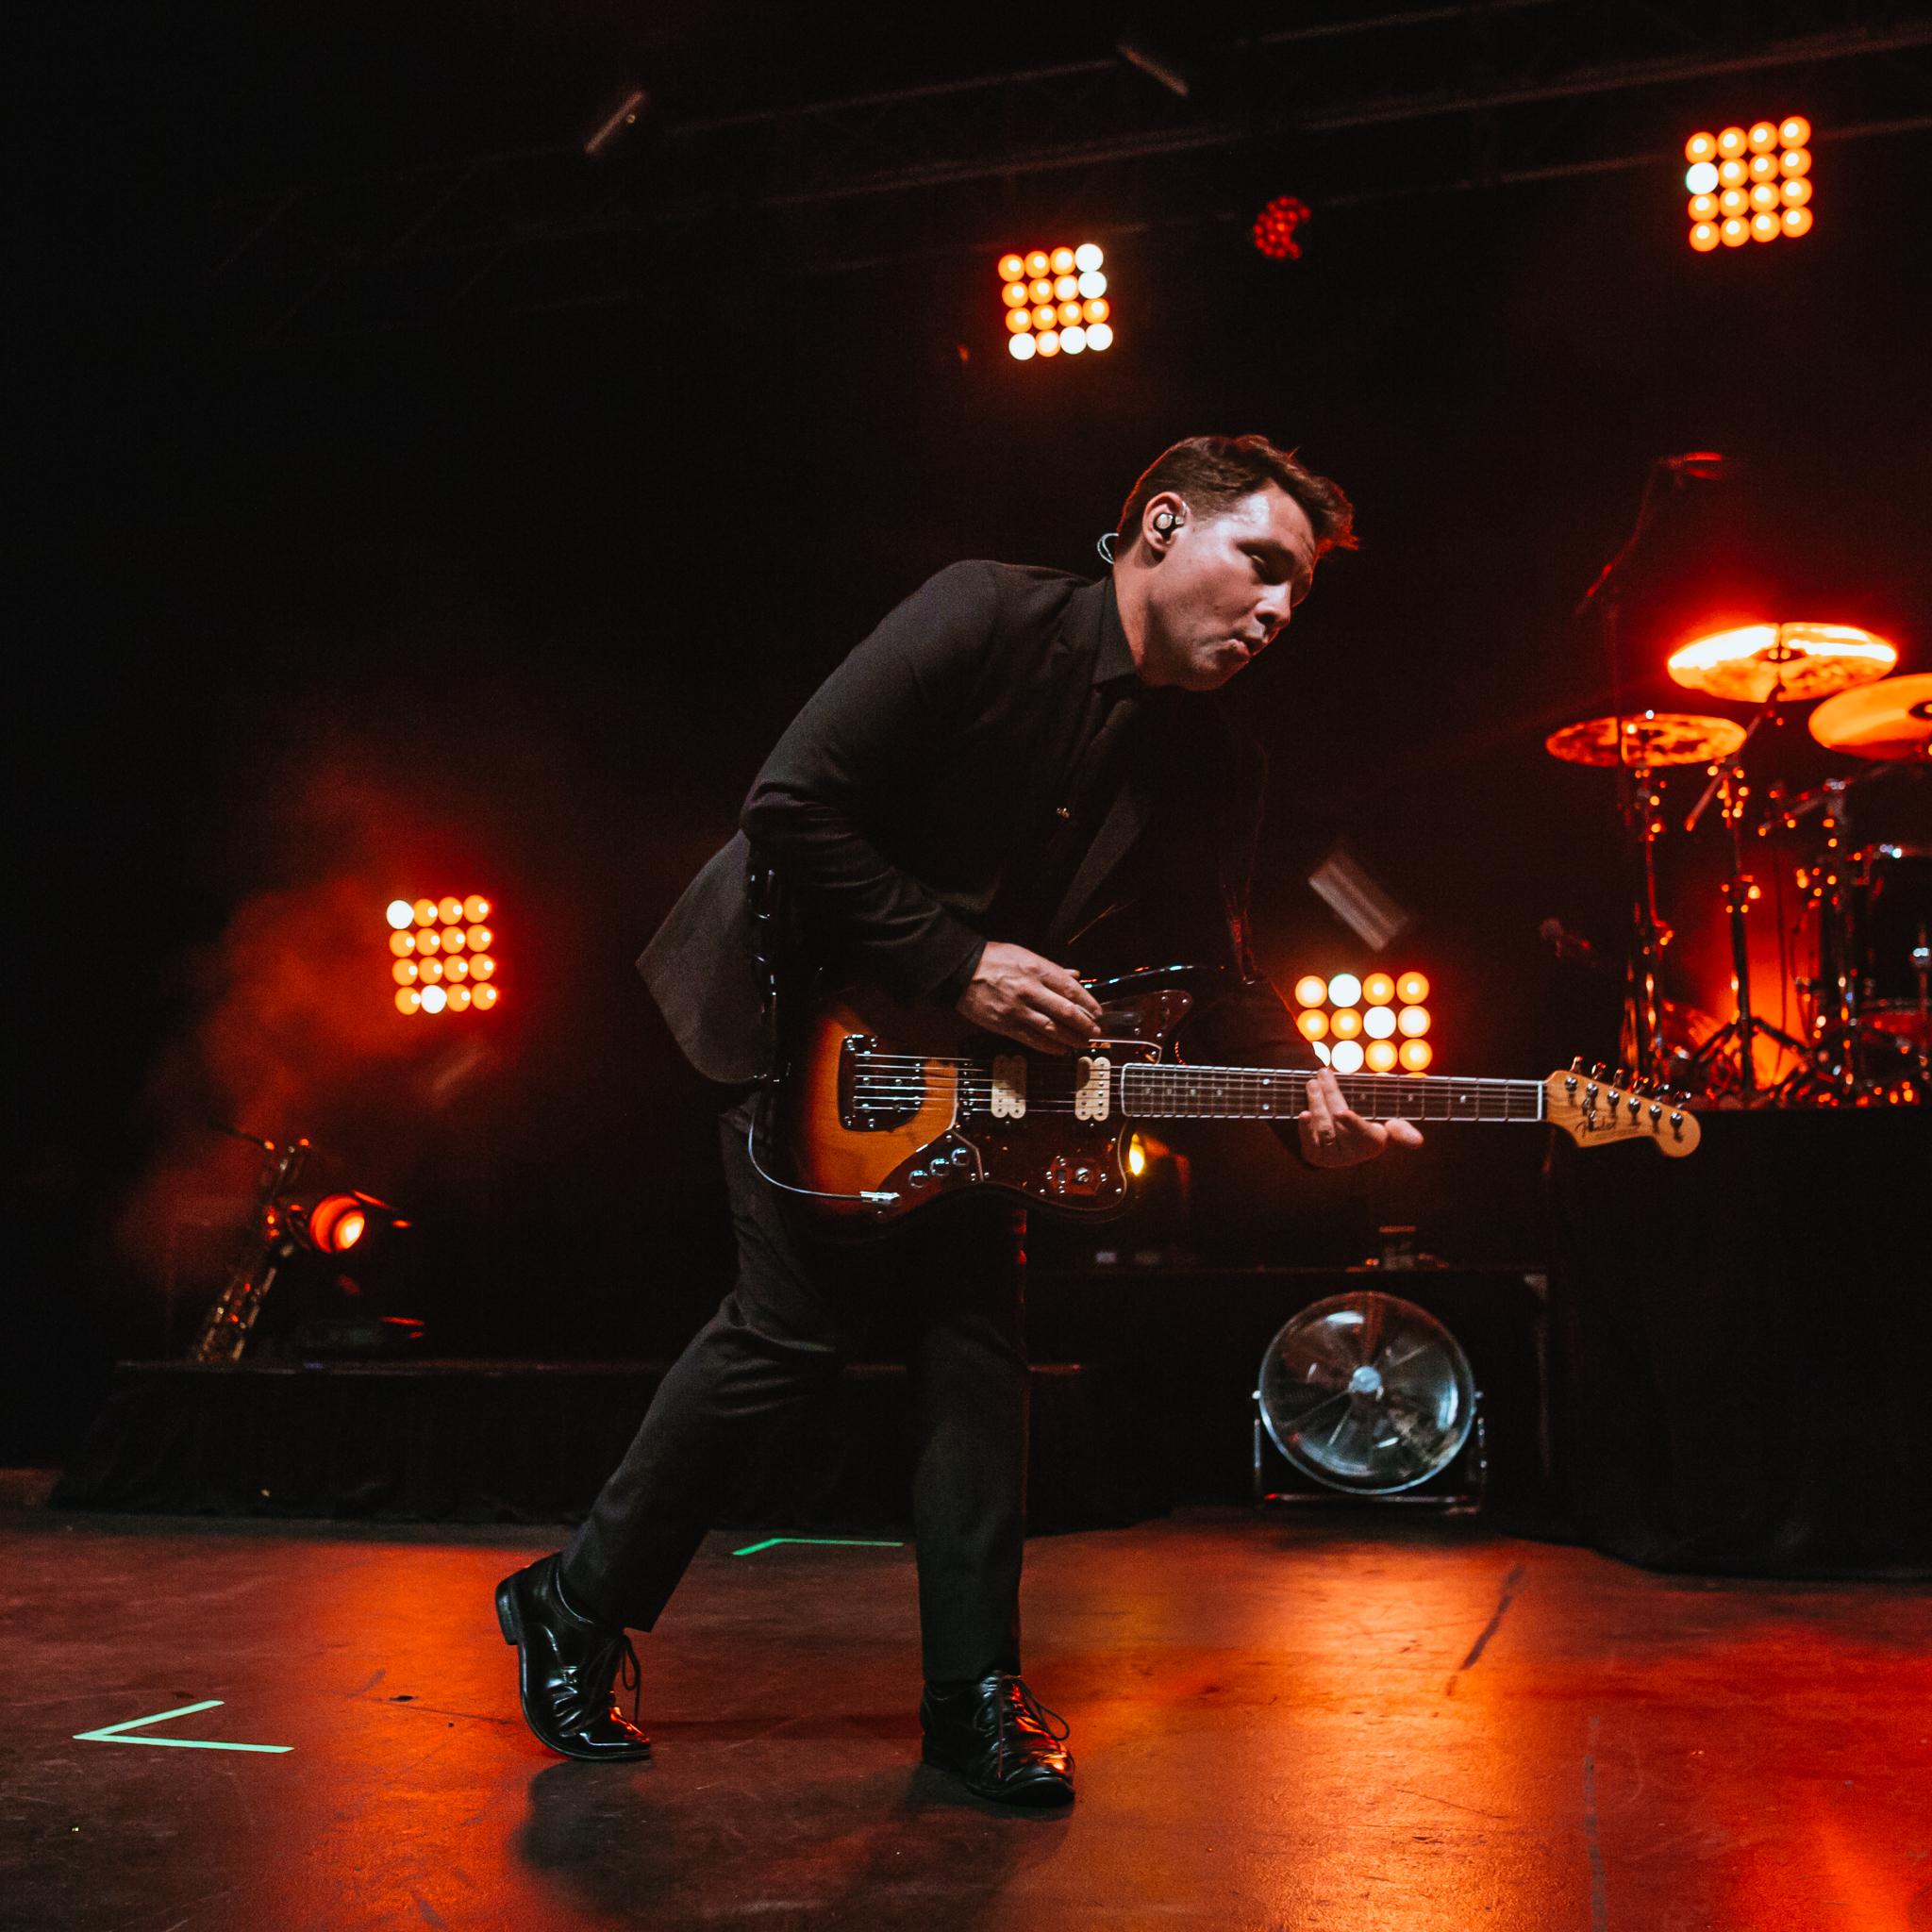 Mitch Lowe Photo - Panic At The Disco - Riverstage-33.jpg